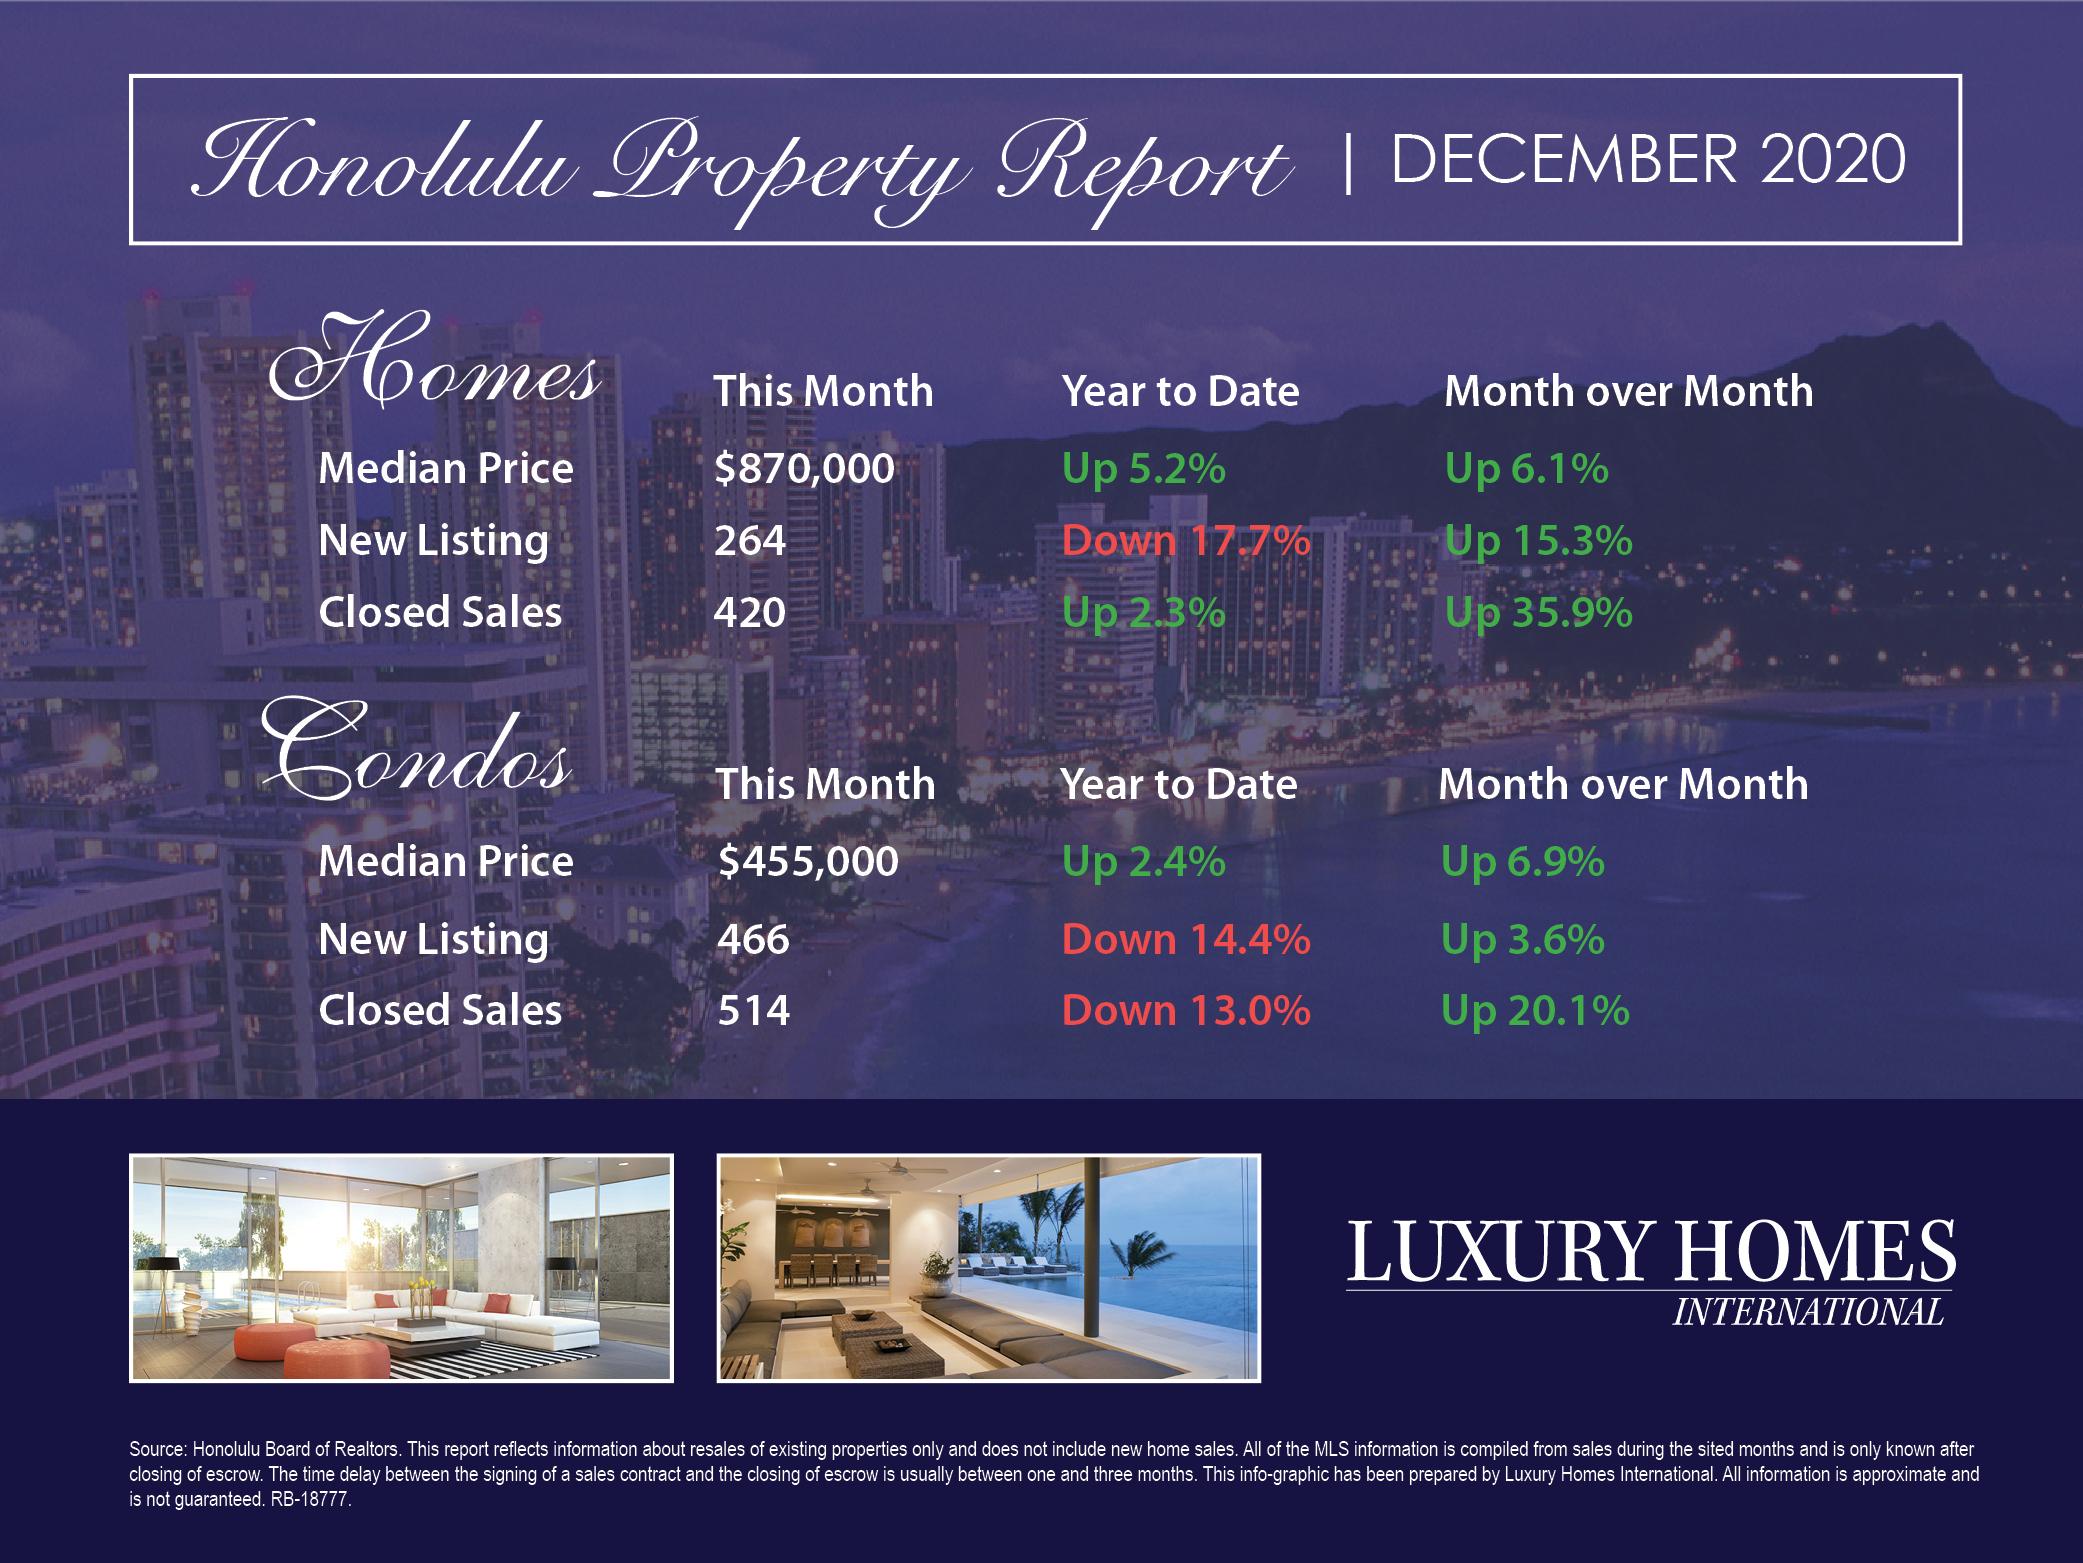 Annual Real Estate Report - December 2020